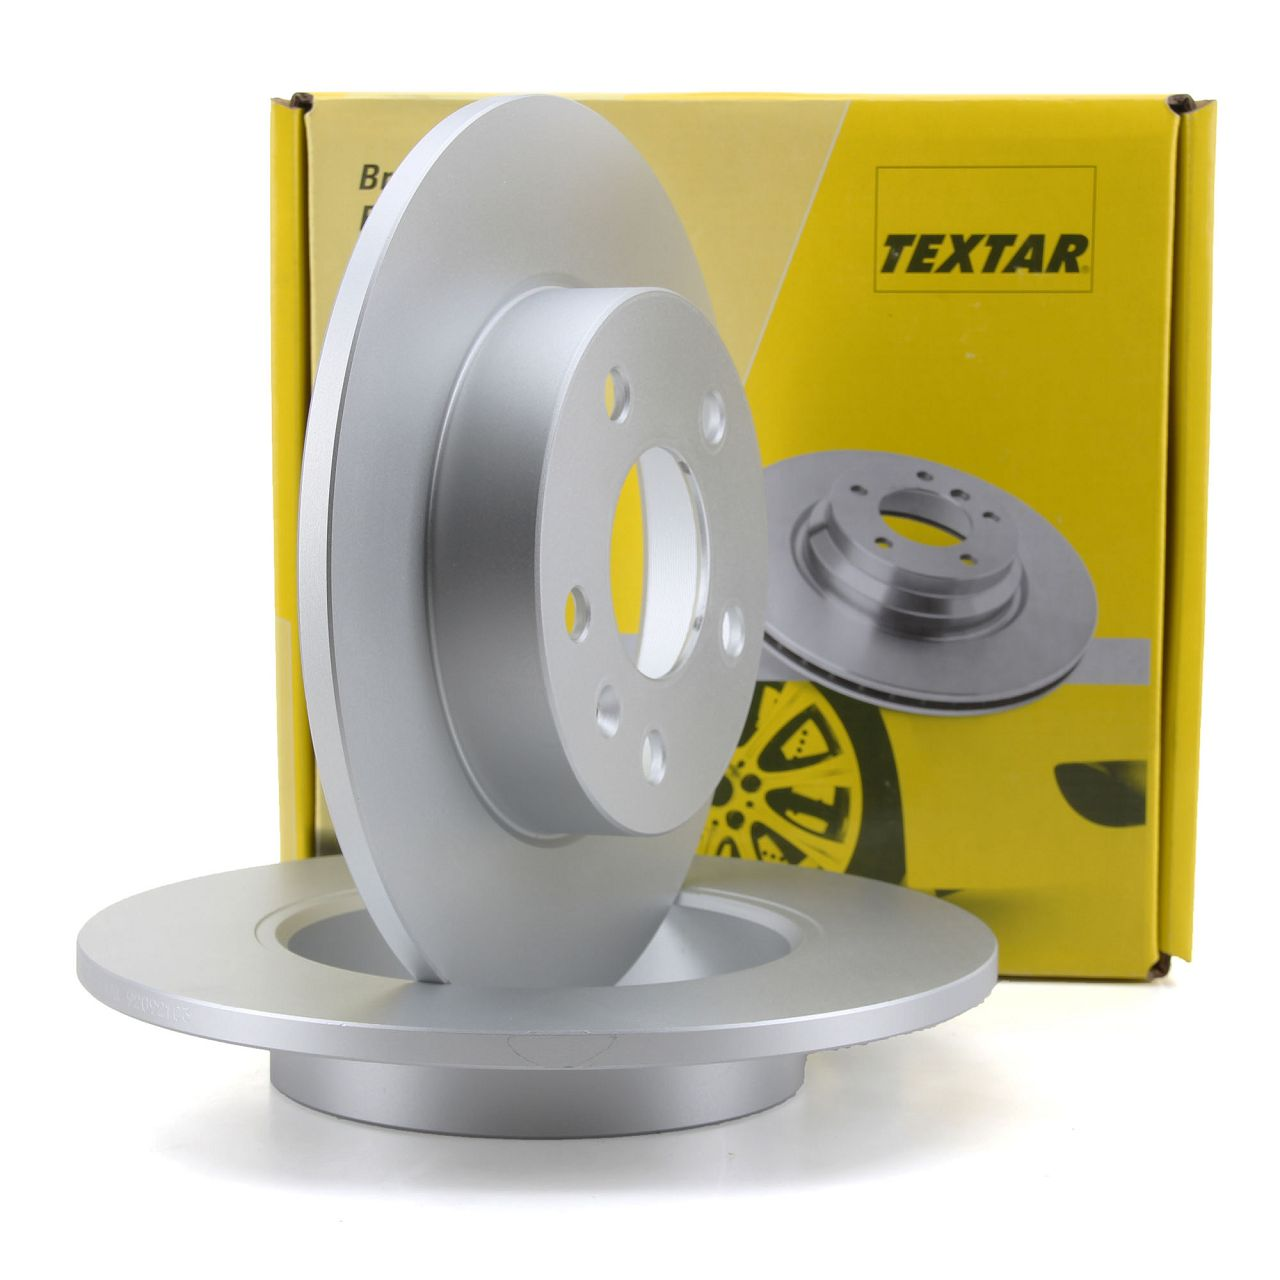 TEXTAR 92092103 Bremsscheiben Satz OPEL Astra G H Corsa C Meriva A B Zafira hinten